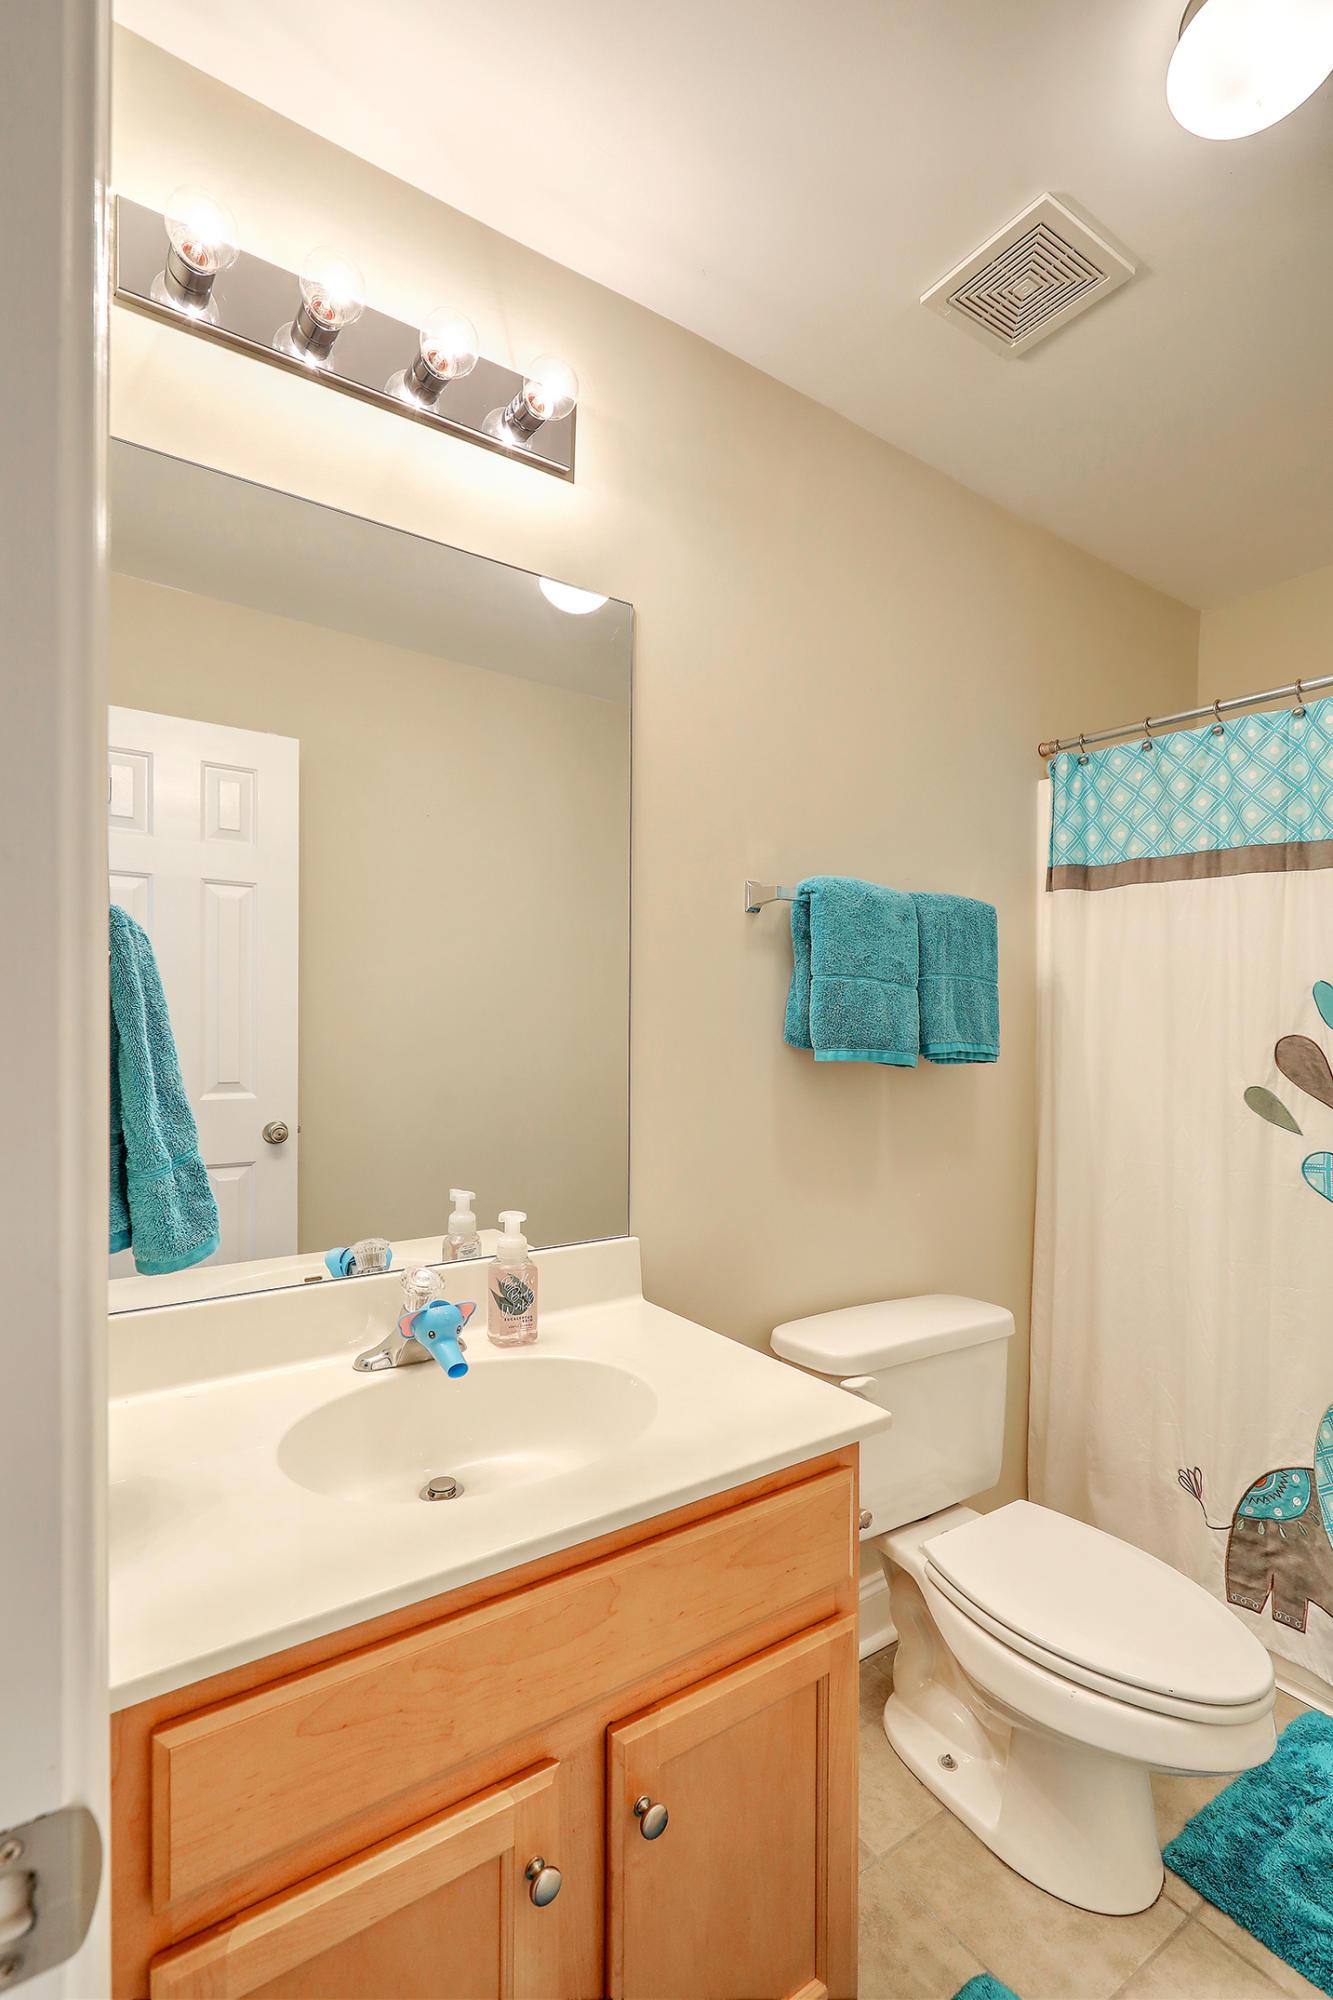 Ashley Park Homes For Sale - 4025 Hartland, Charleston, SC - 3